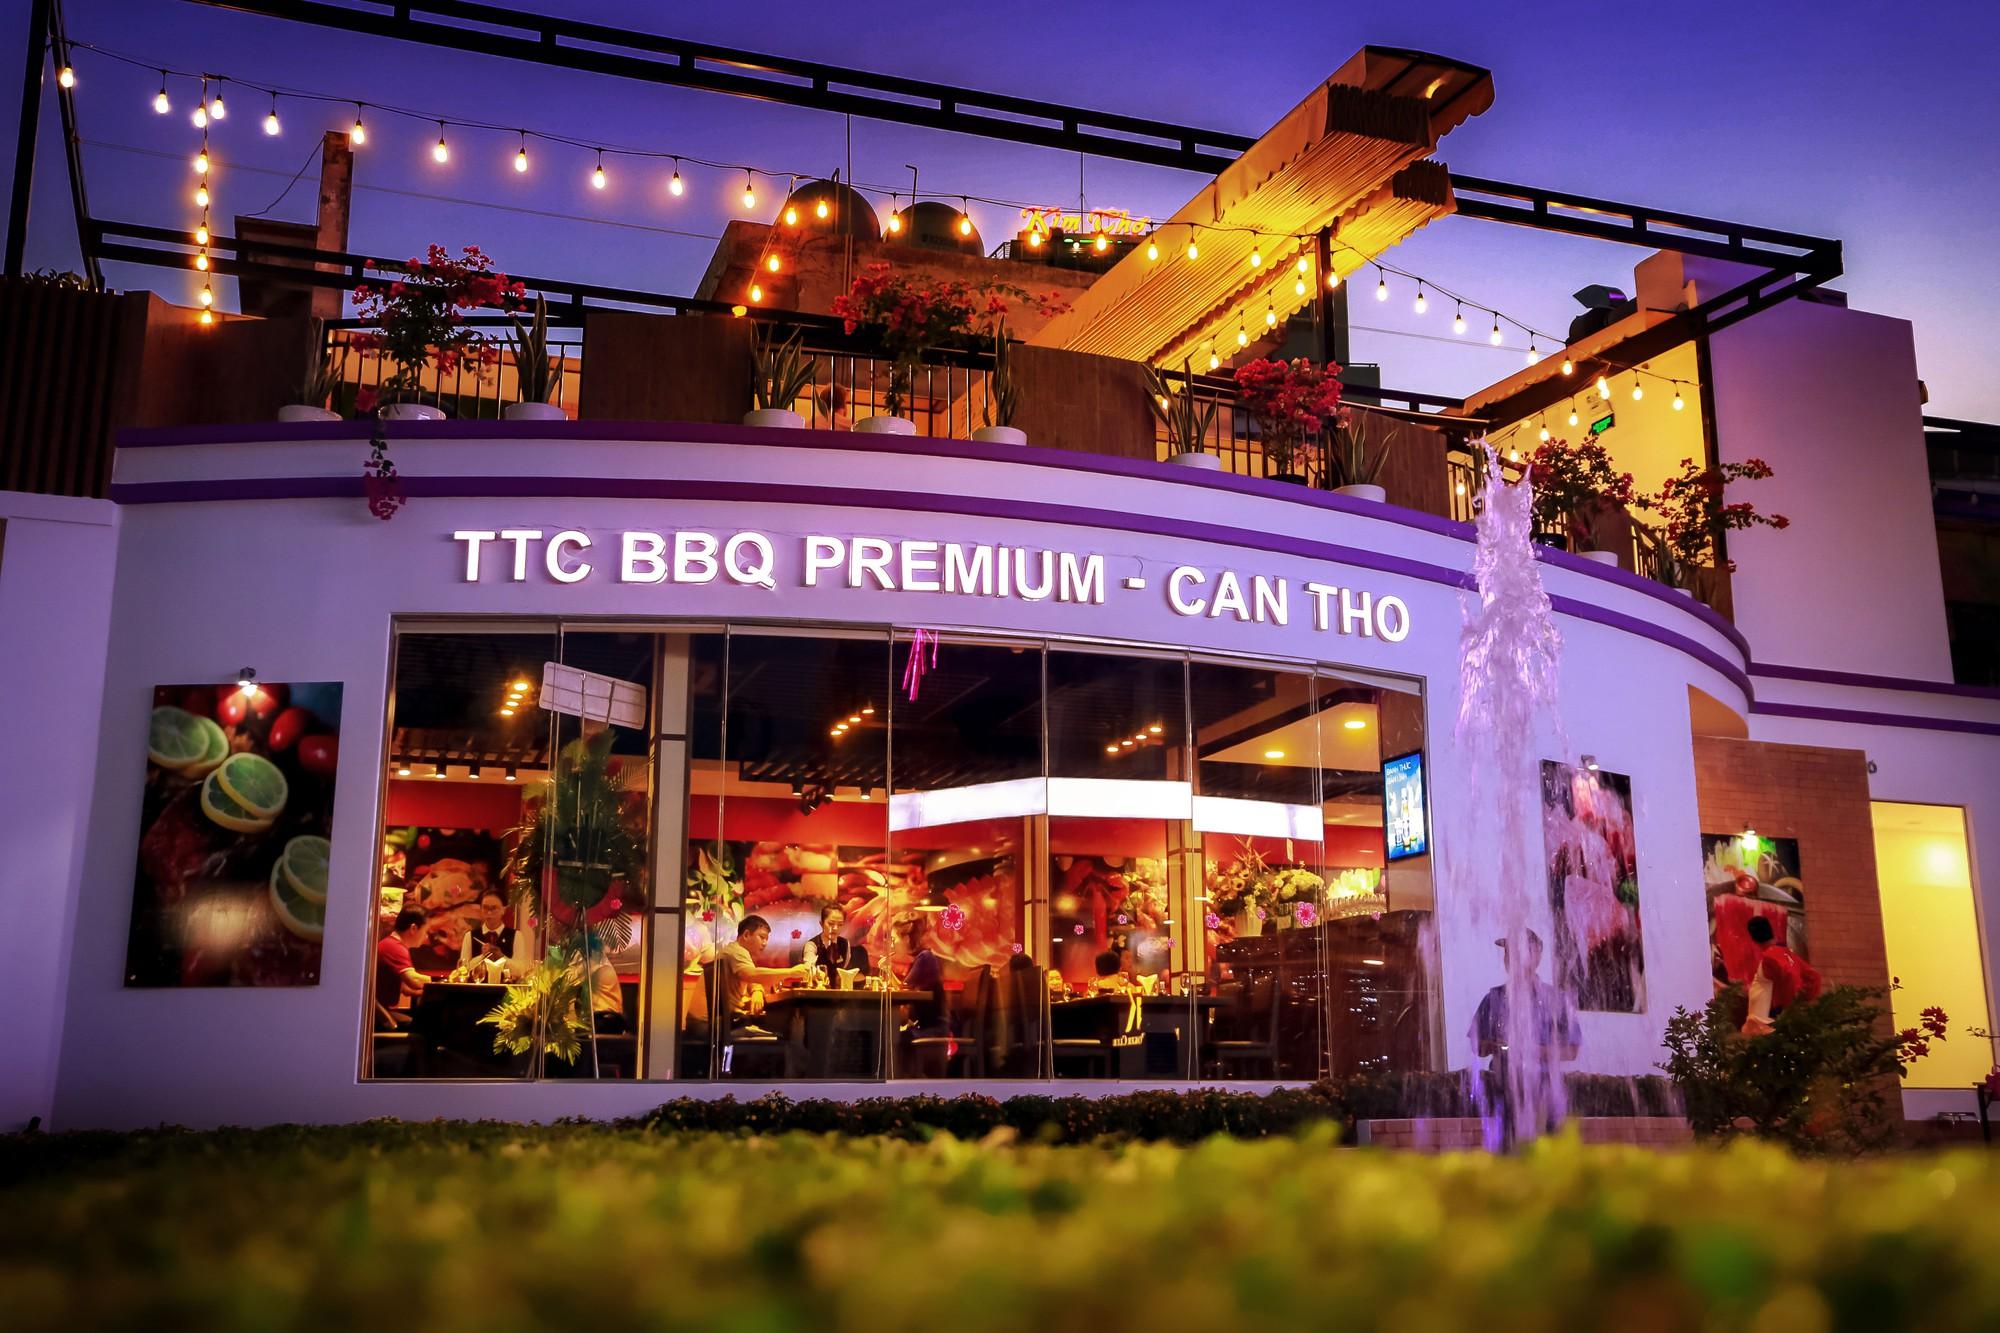 Nha hang TTC BBQ Premium Can Tho